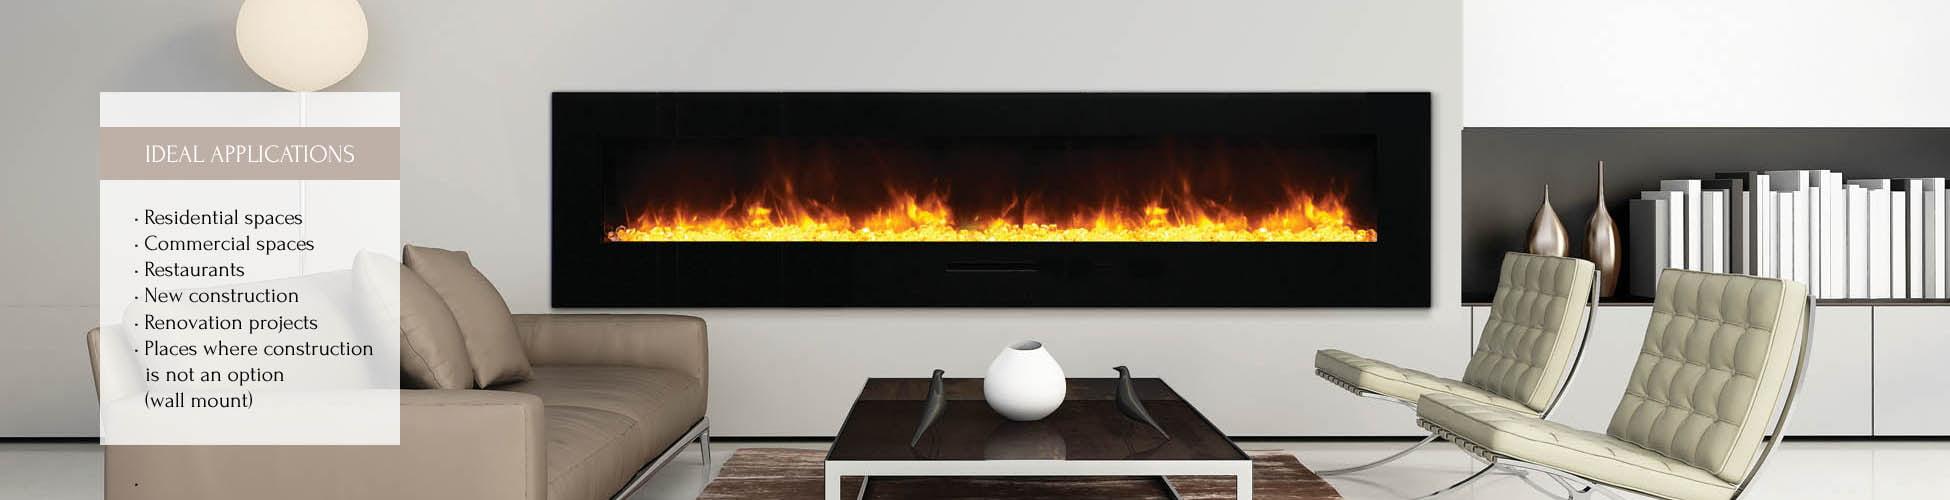 WM-FM-88-100 23-BG electlric fireplace